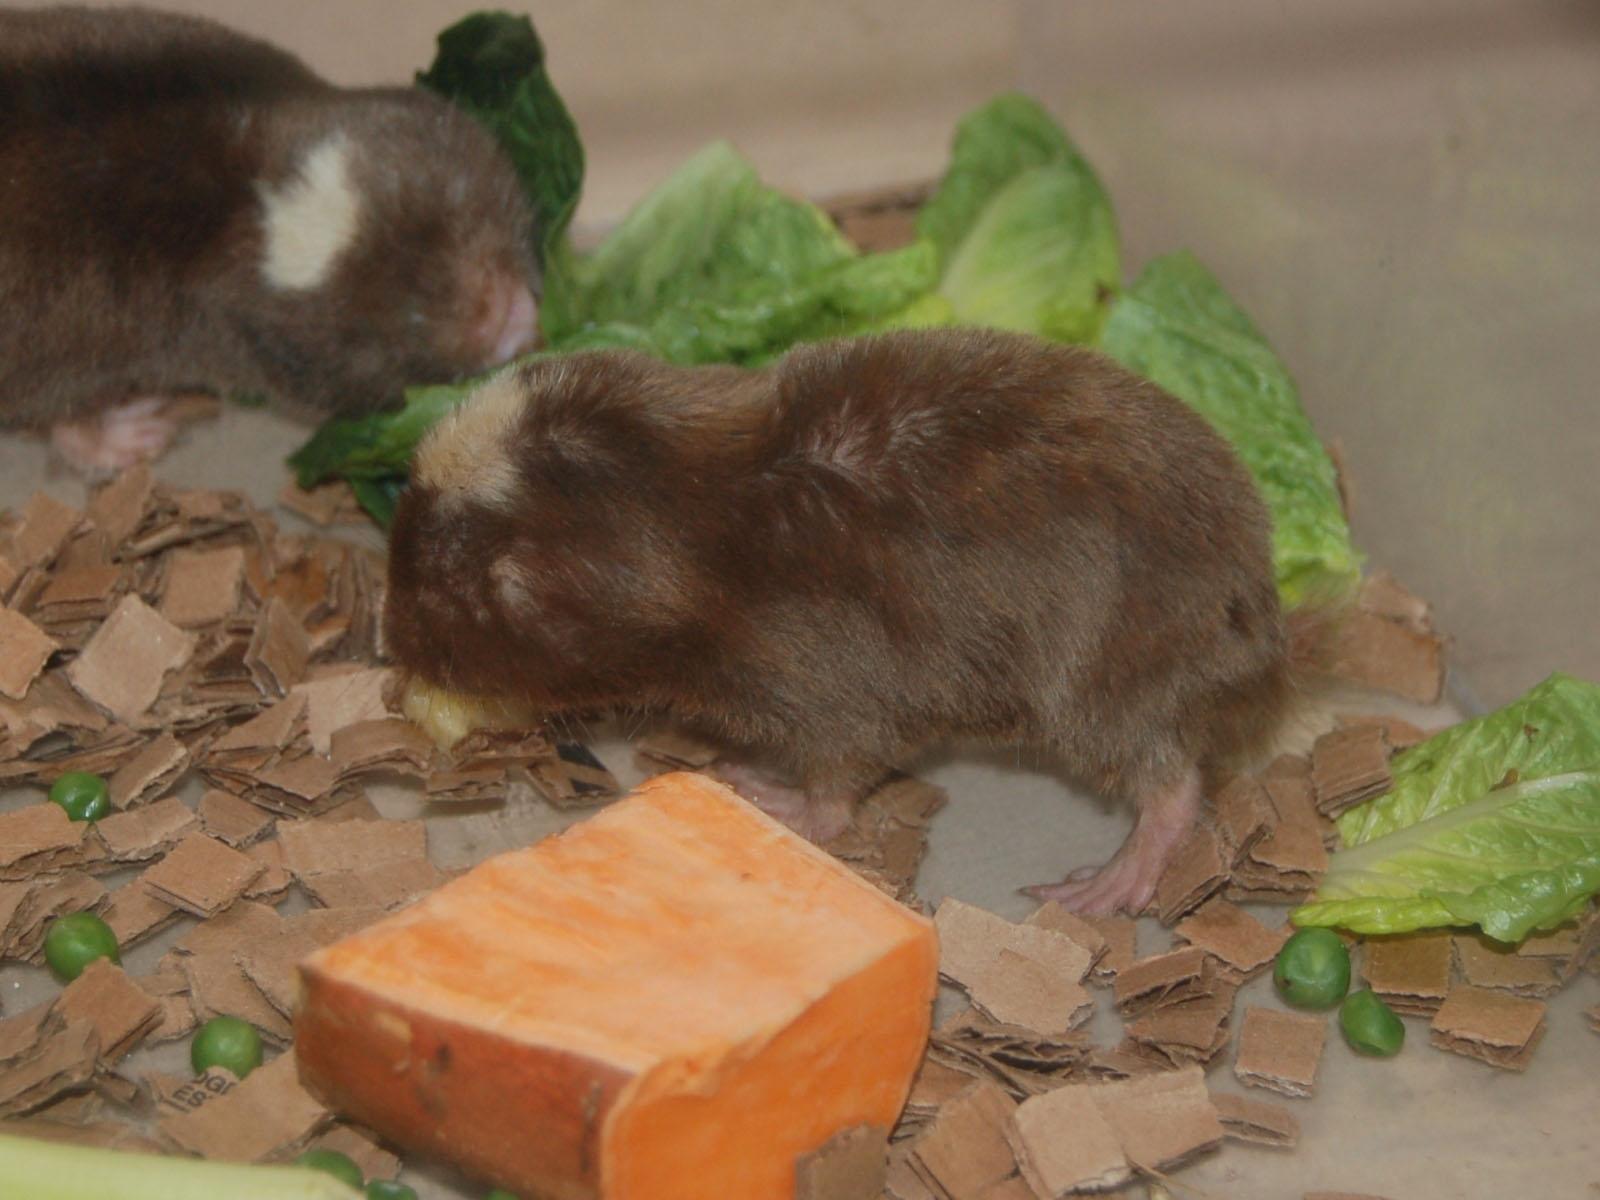 The Online Zoo Damaraland Mole Rat